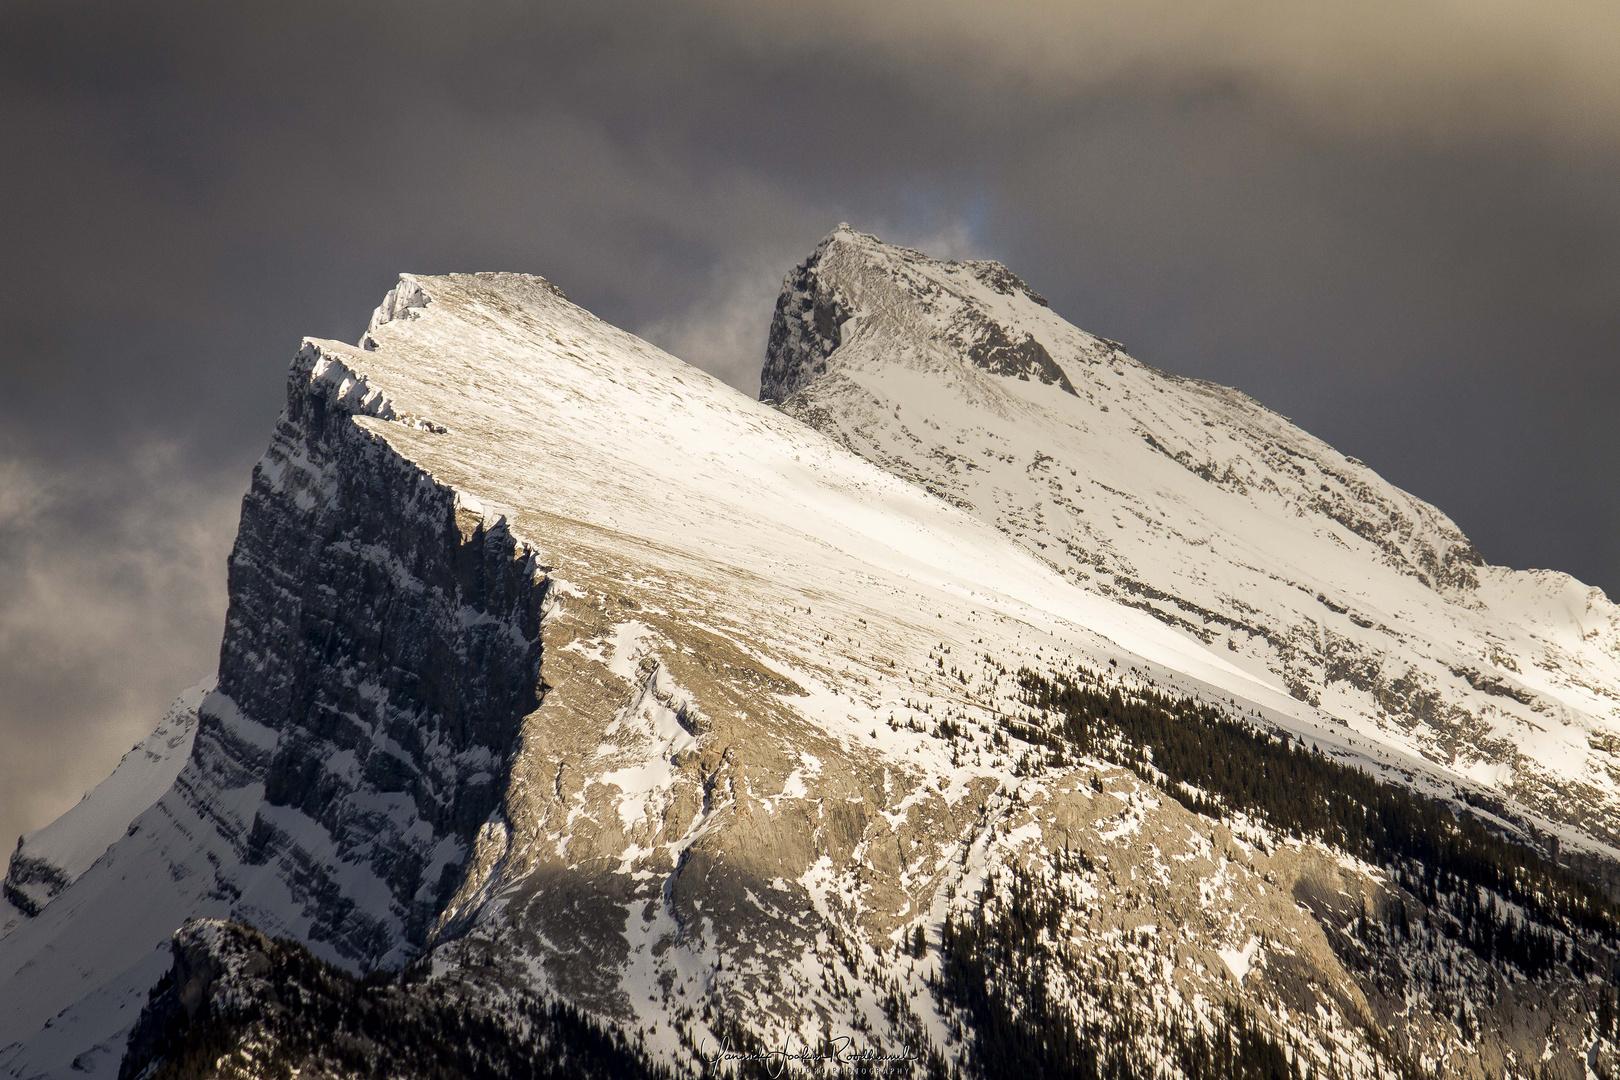 The majestic Mt. Rundle